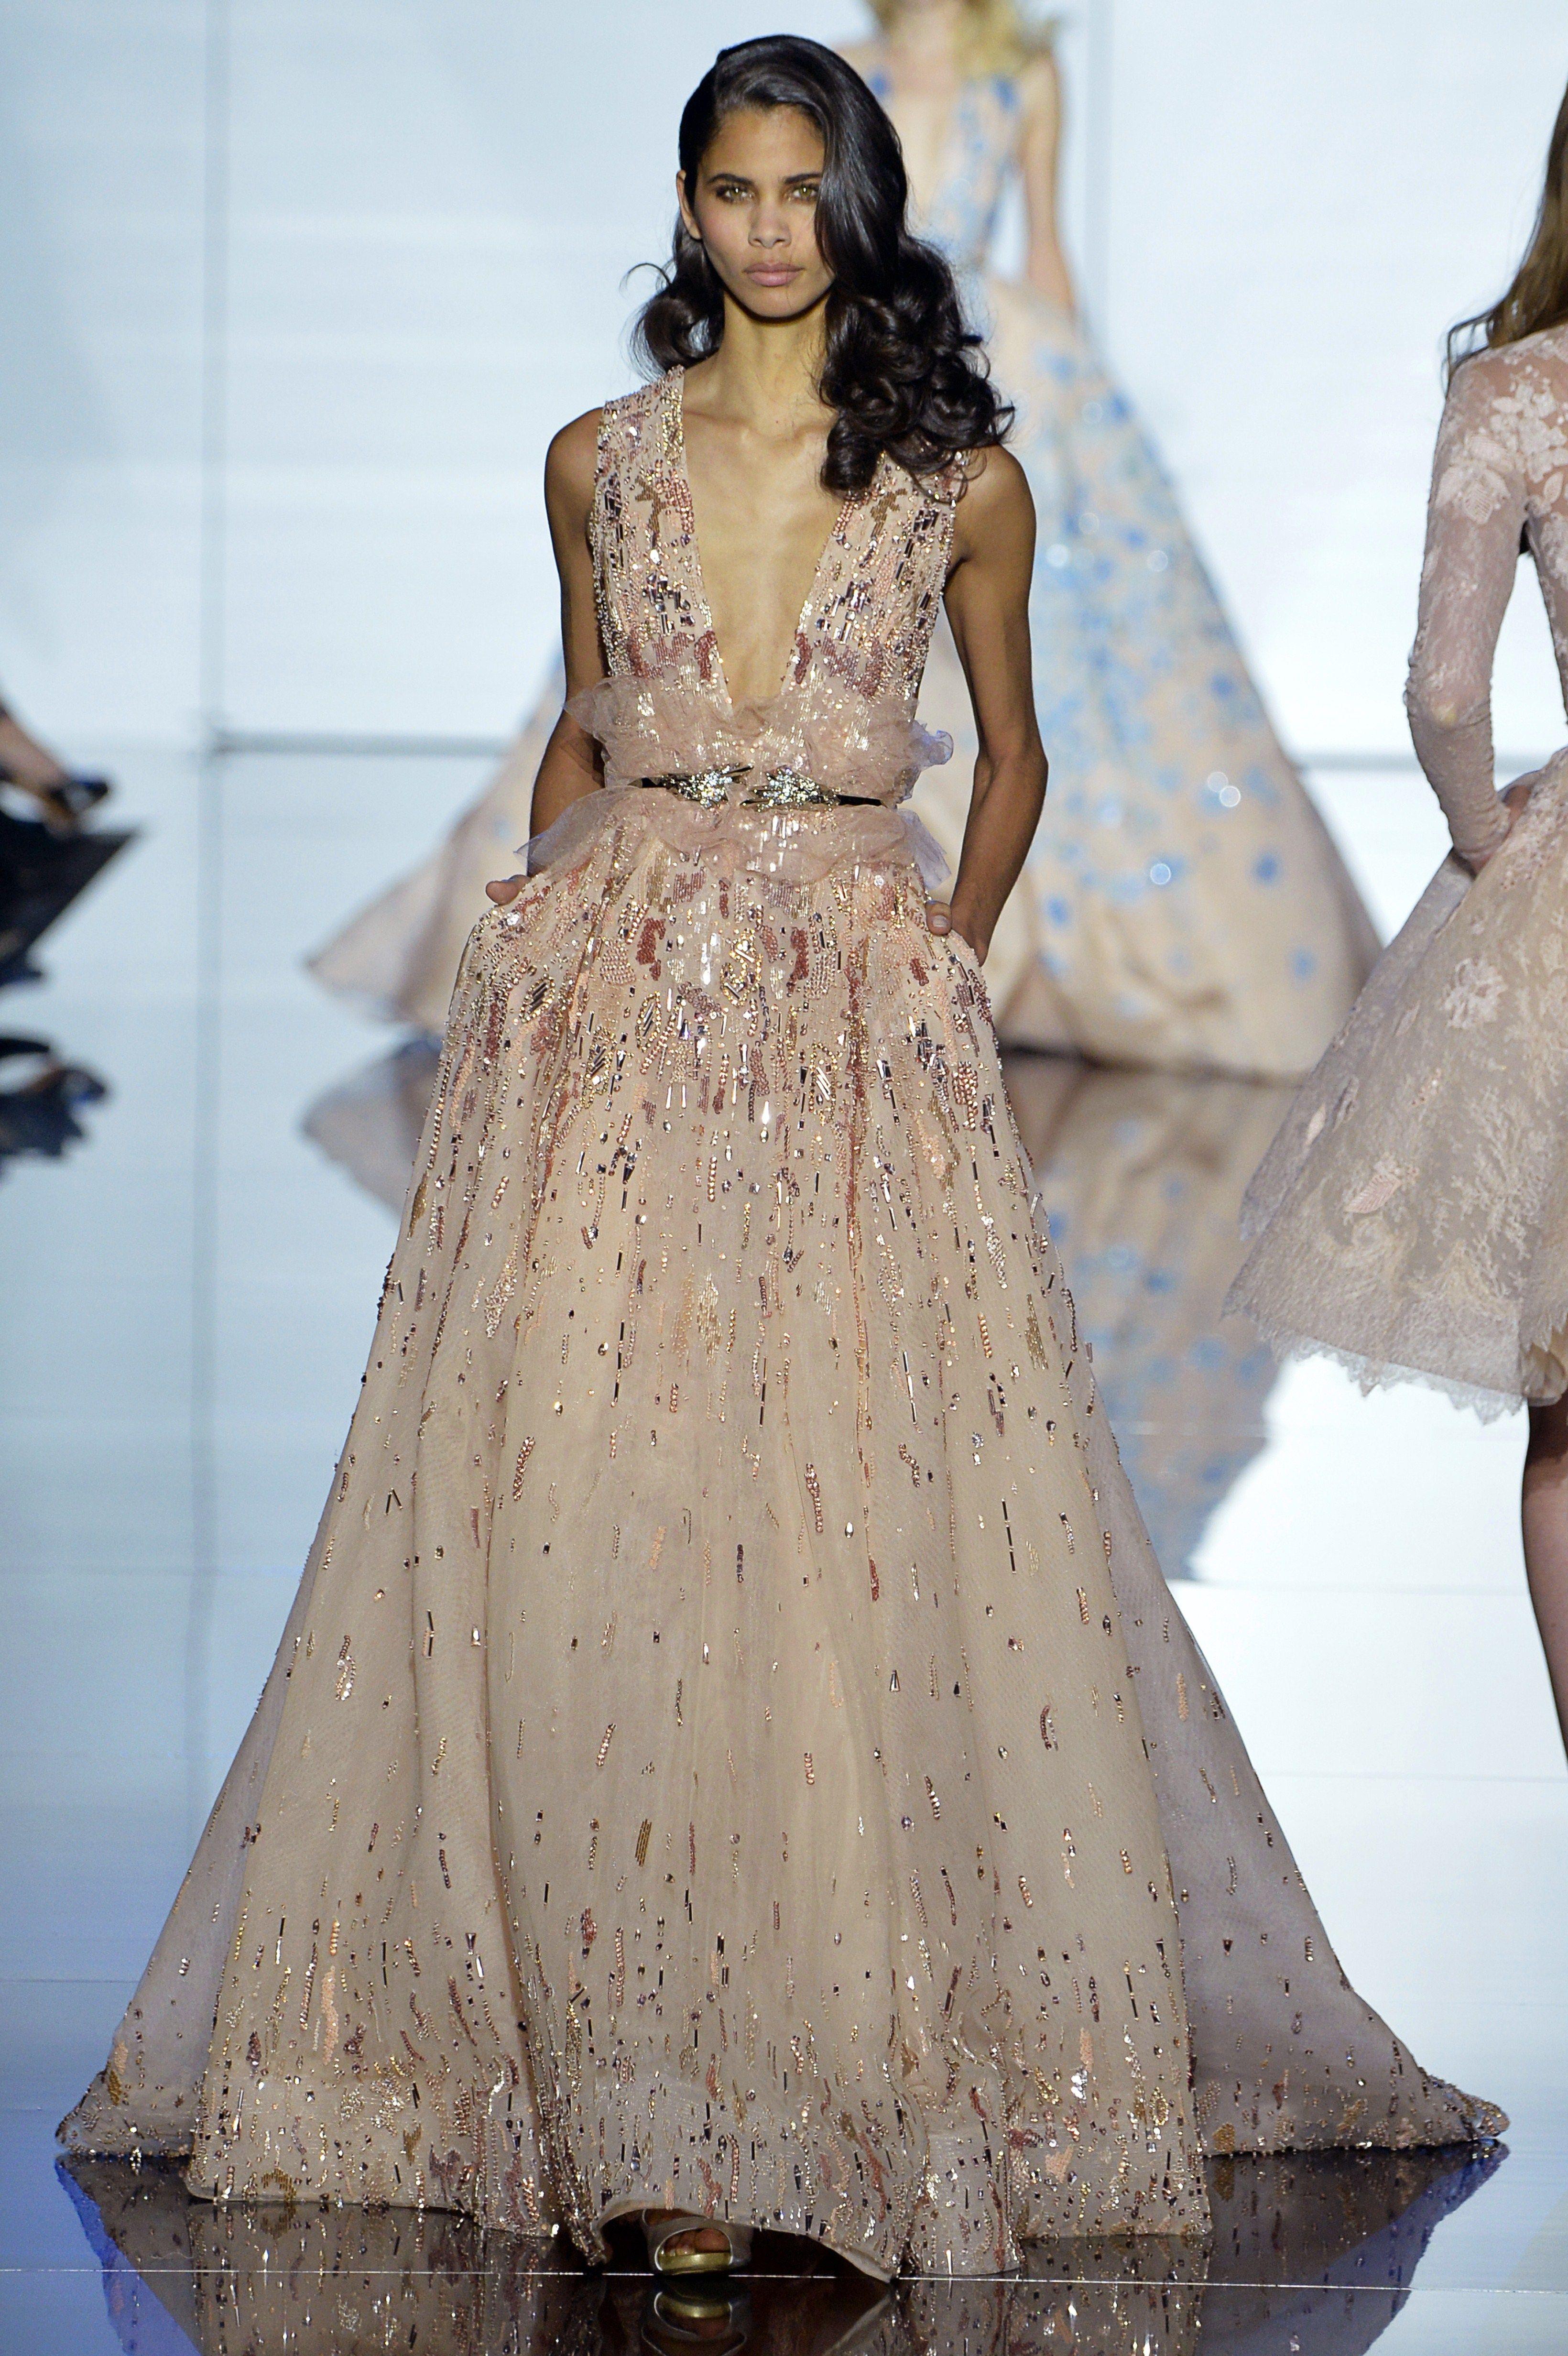 39 Paris Couture Fashion Week Wedding Dresses Every Bride